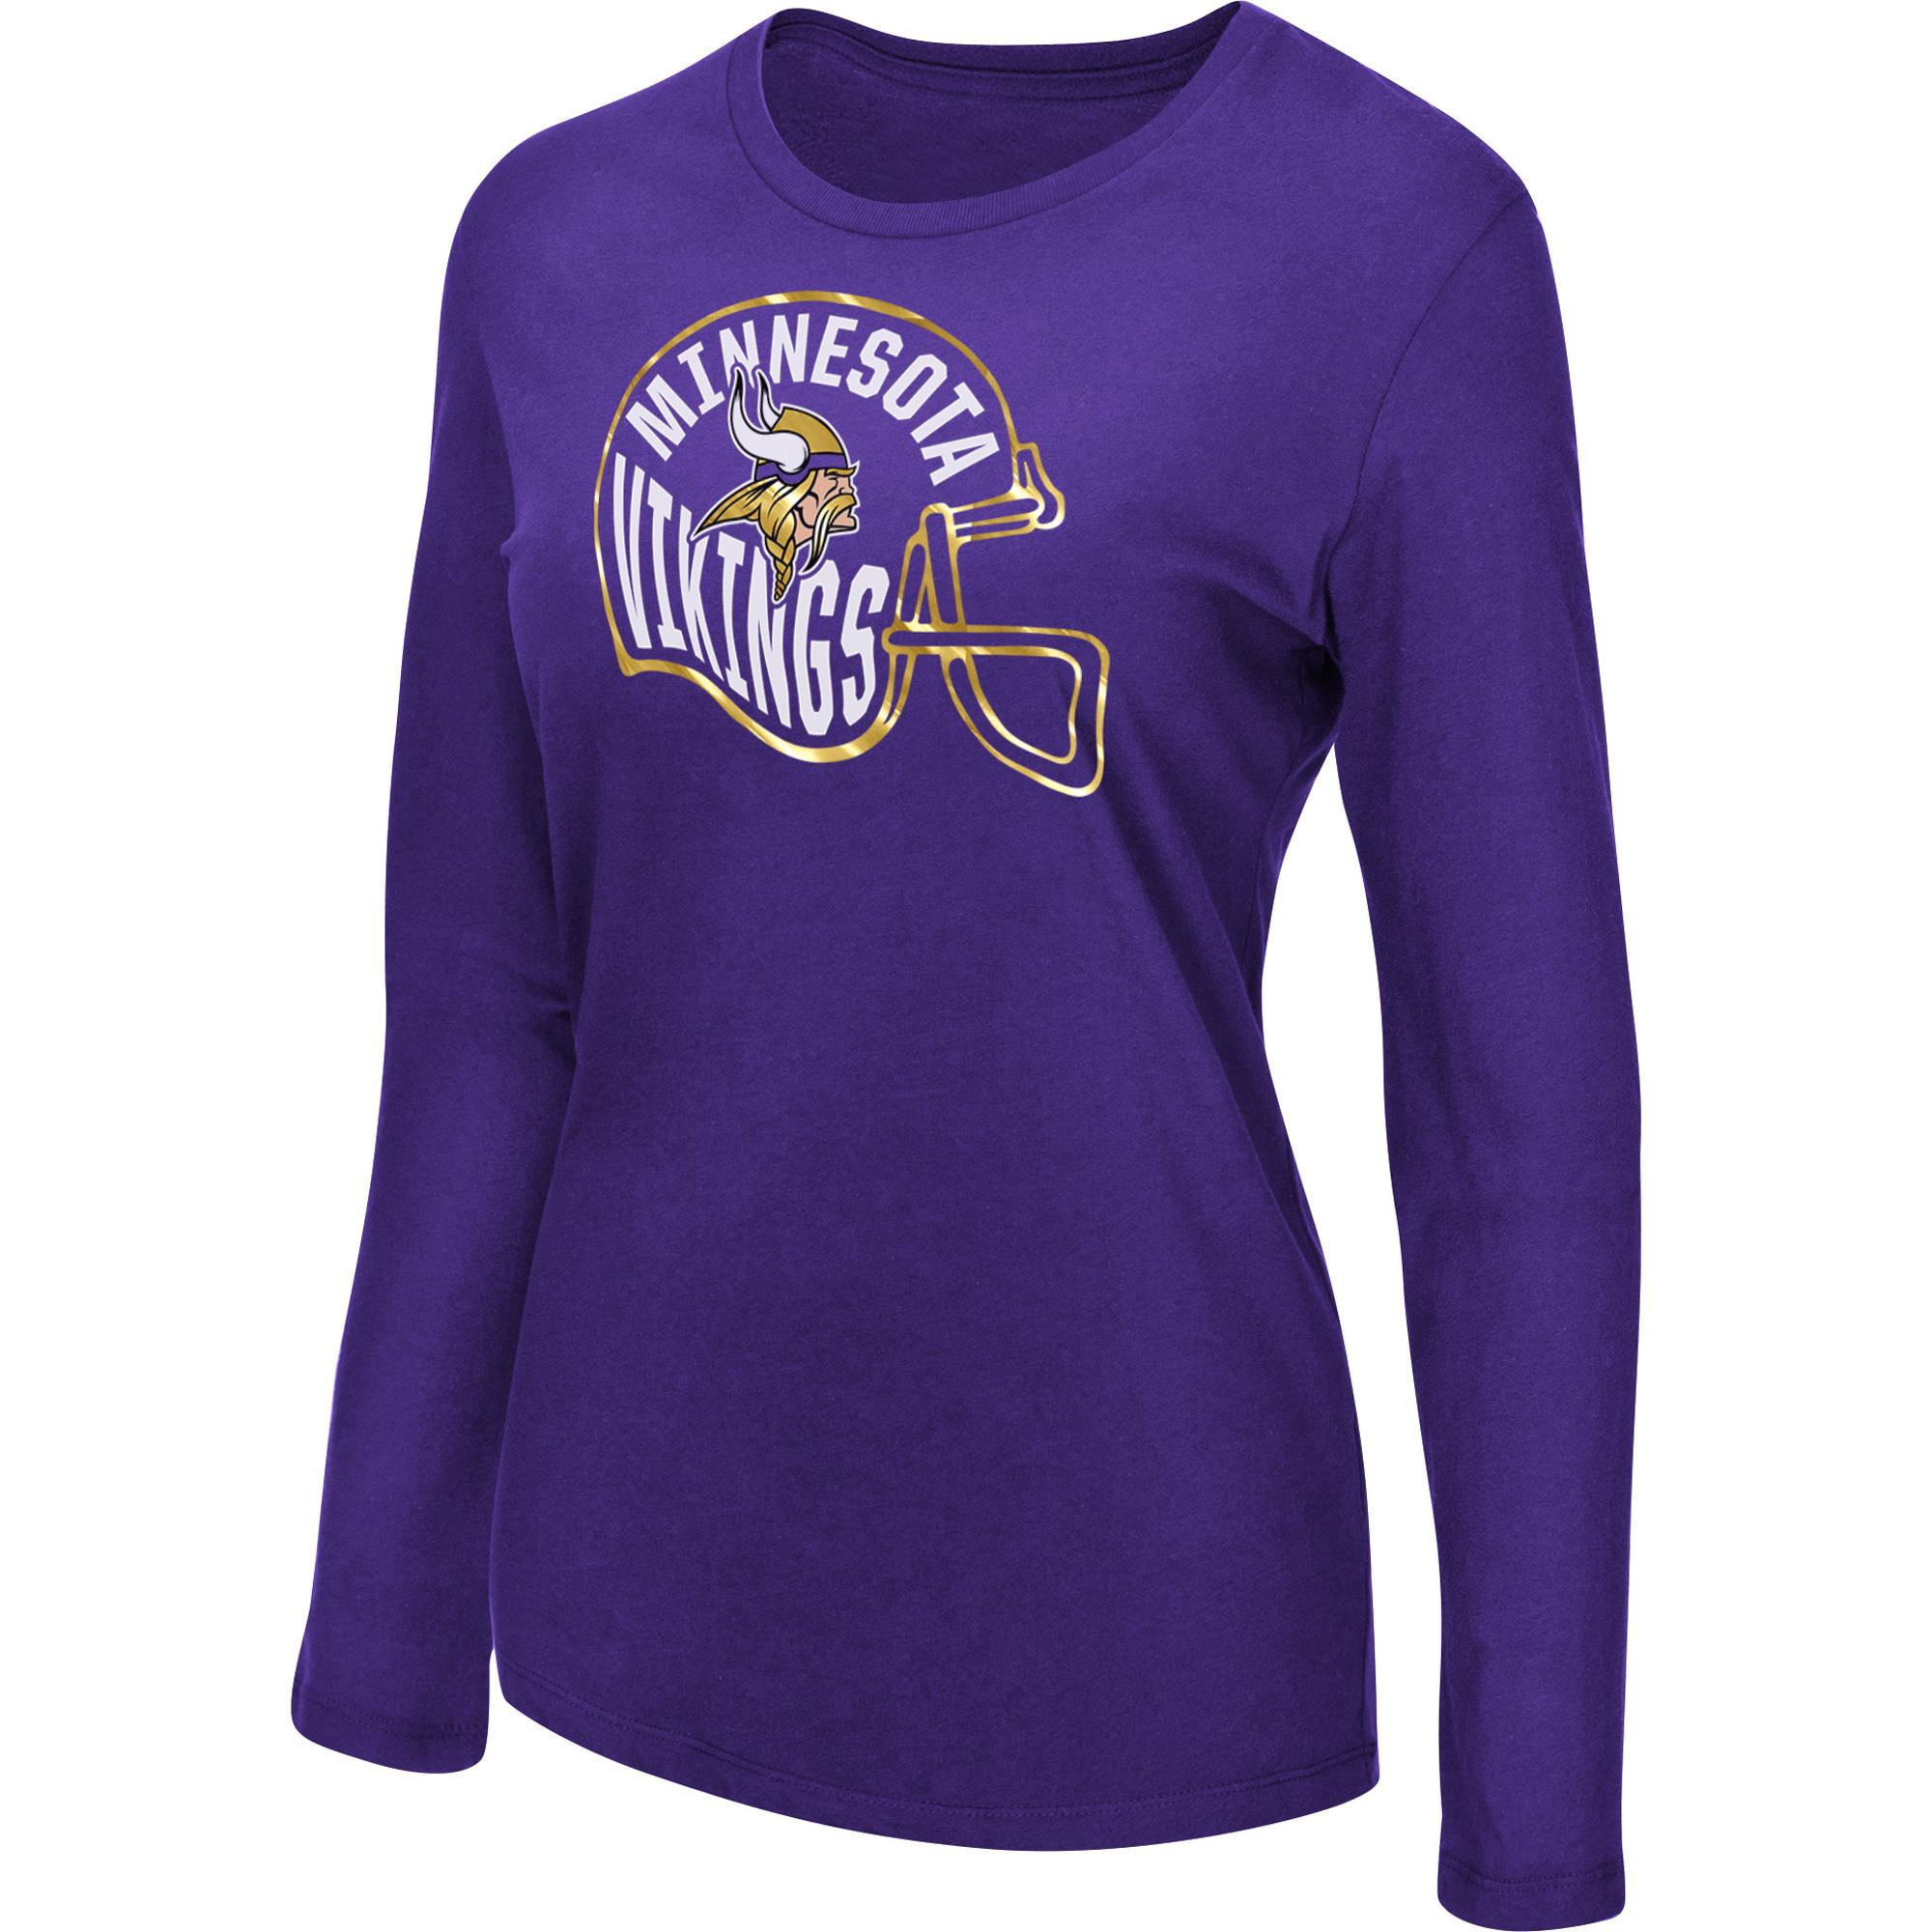 Women's Majestic Purple Minnesota Vikings Turn it Loose Long Sleeve T-Shirt